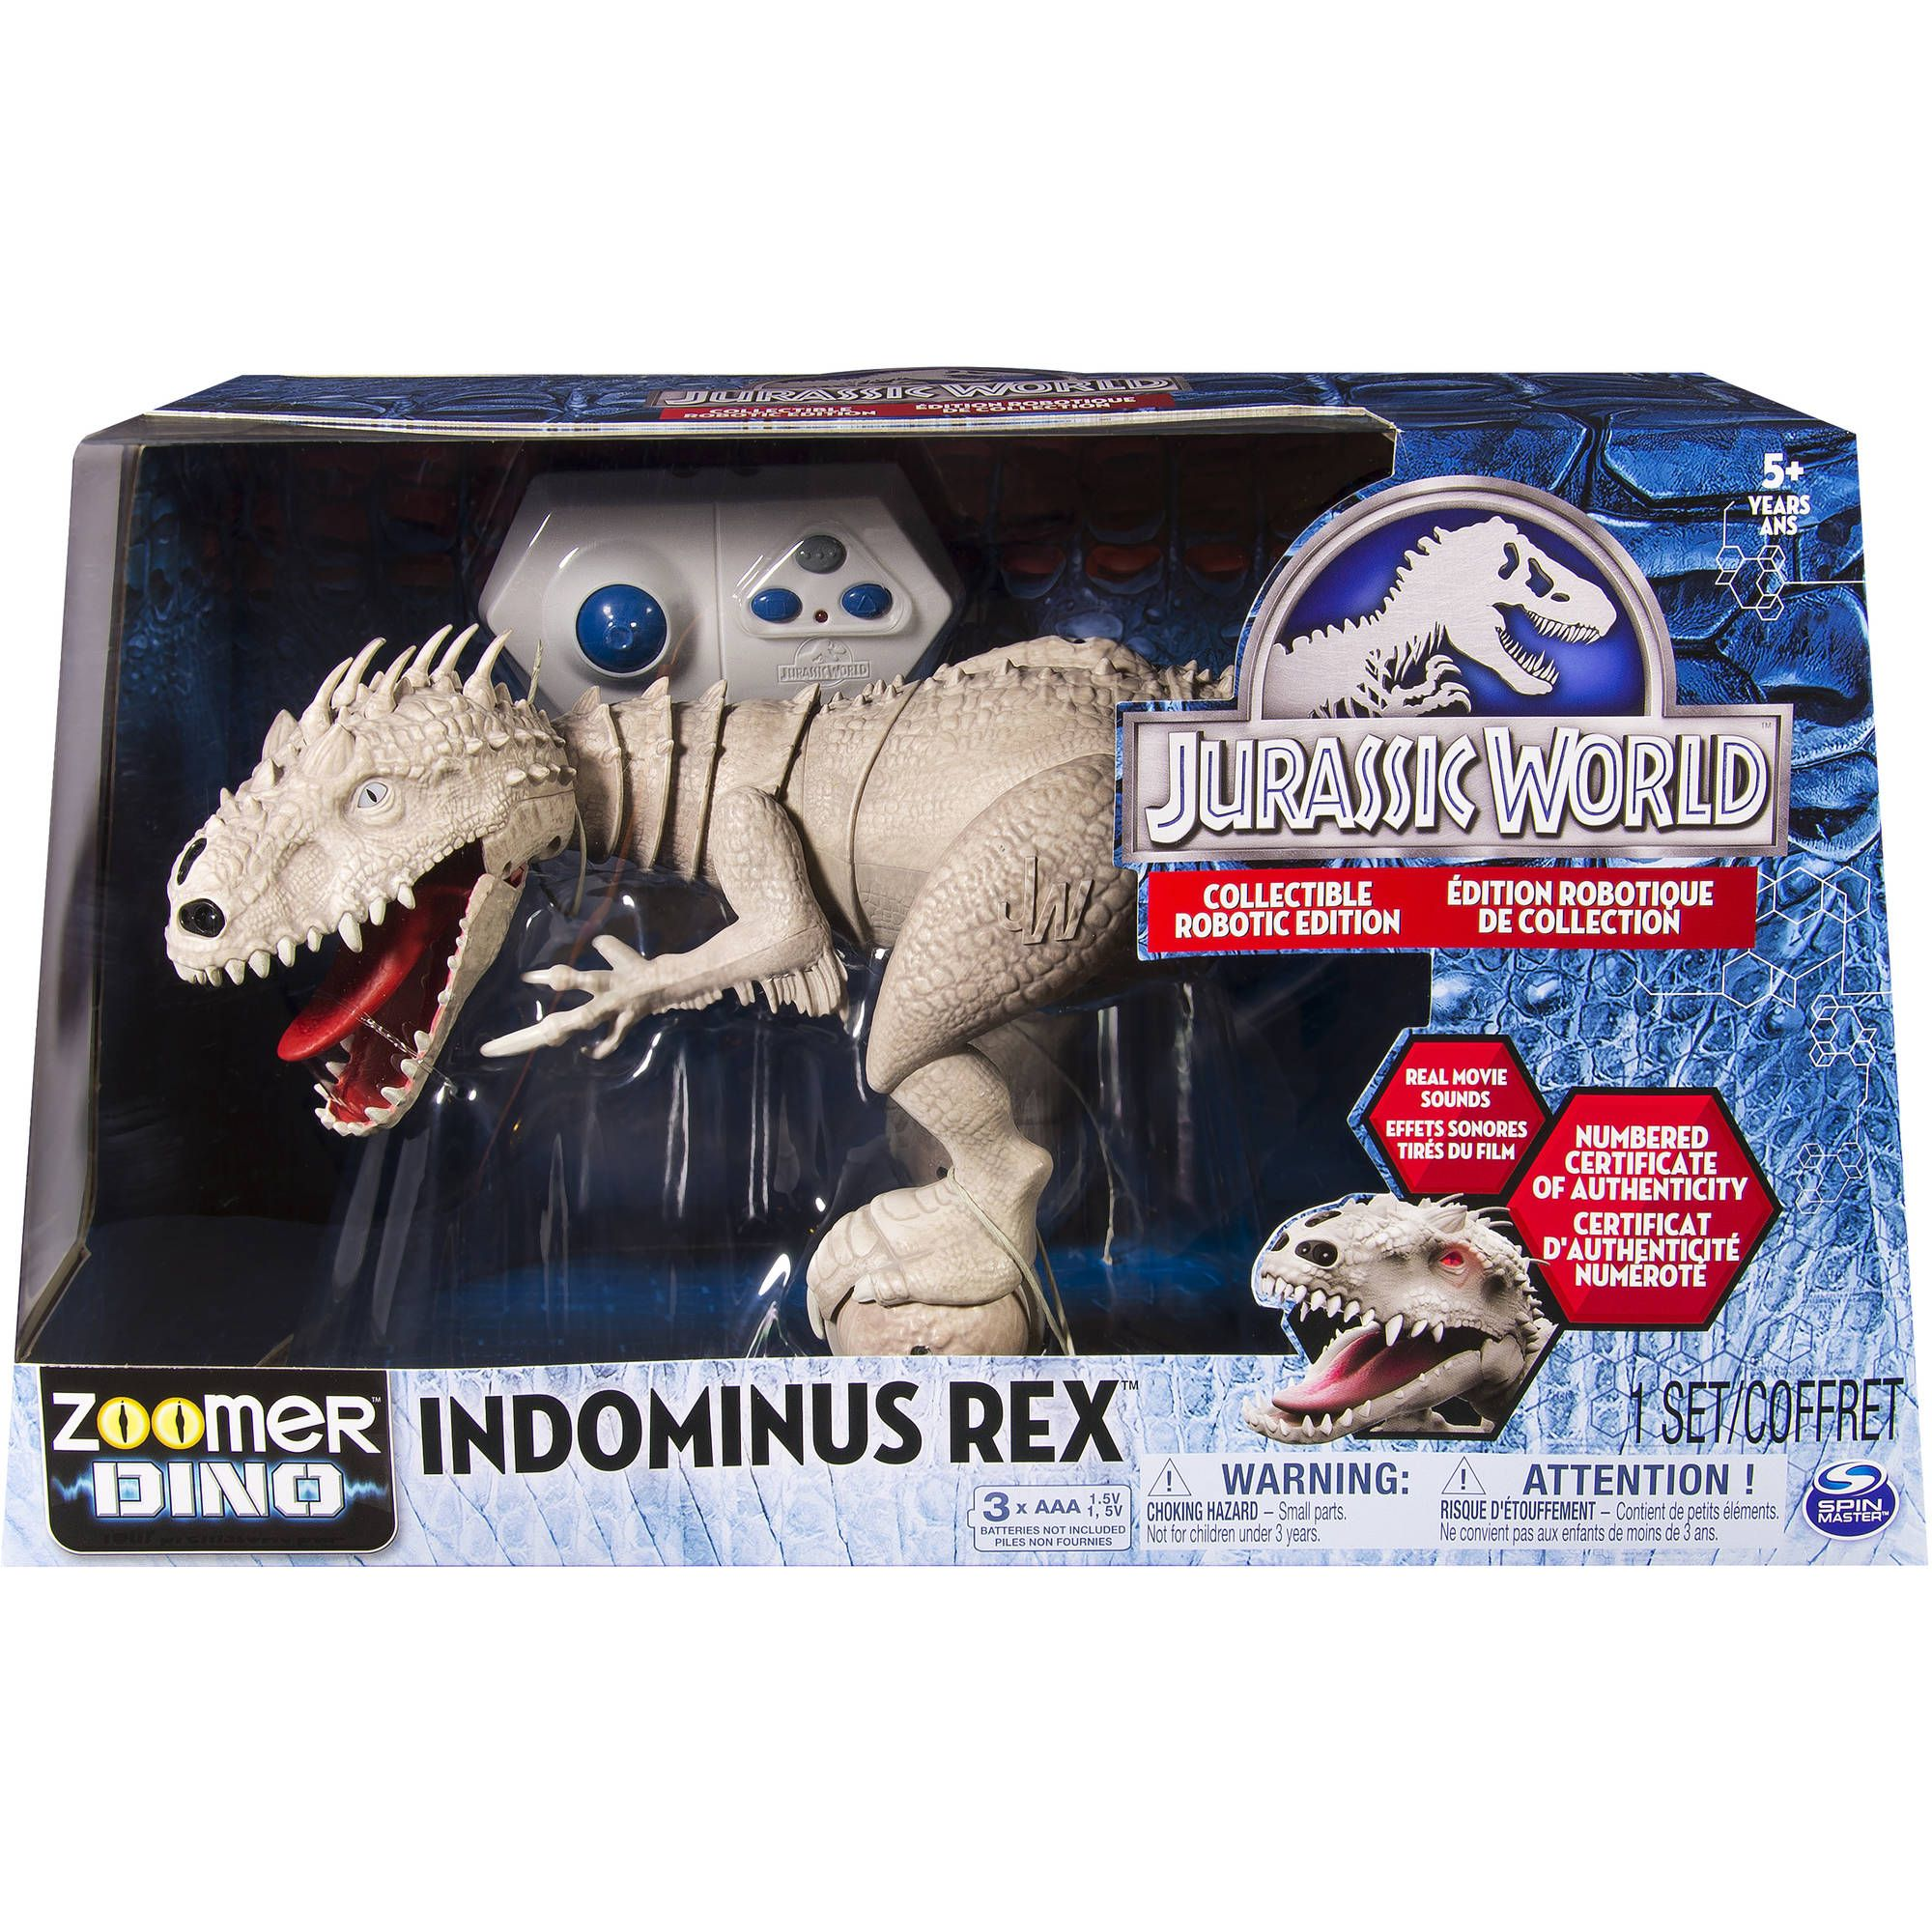 Toys Jurassic world indominus rex, Indominus rex